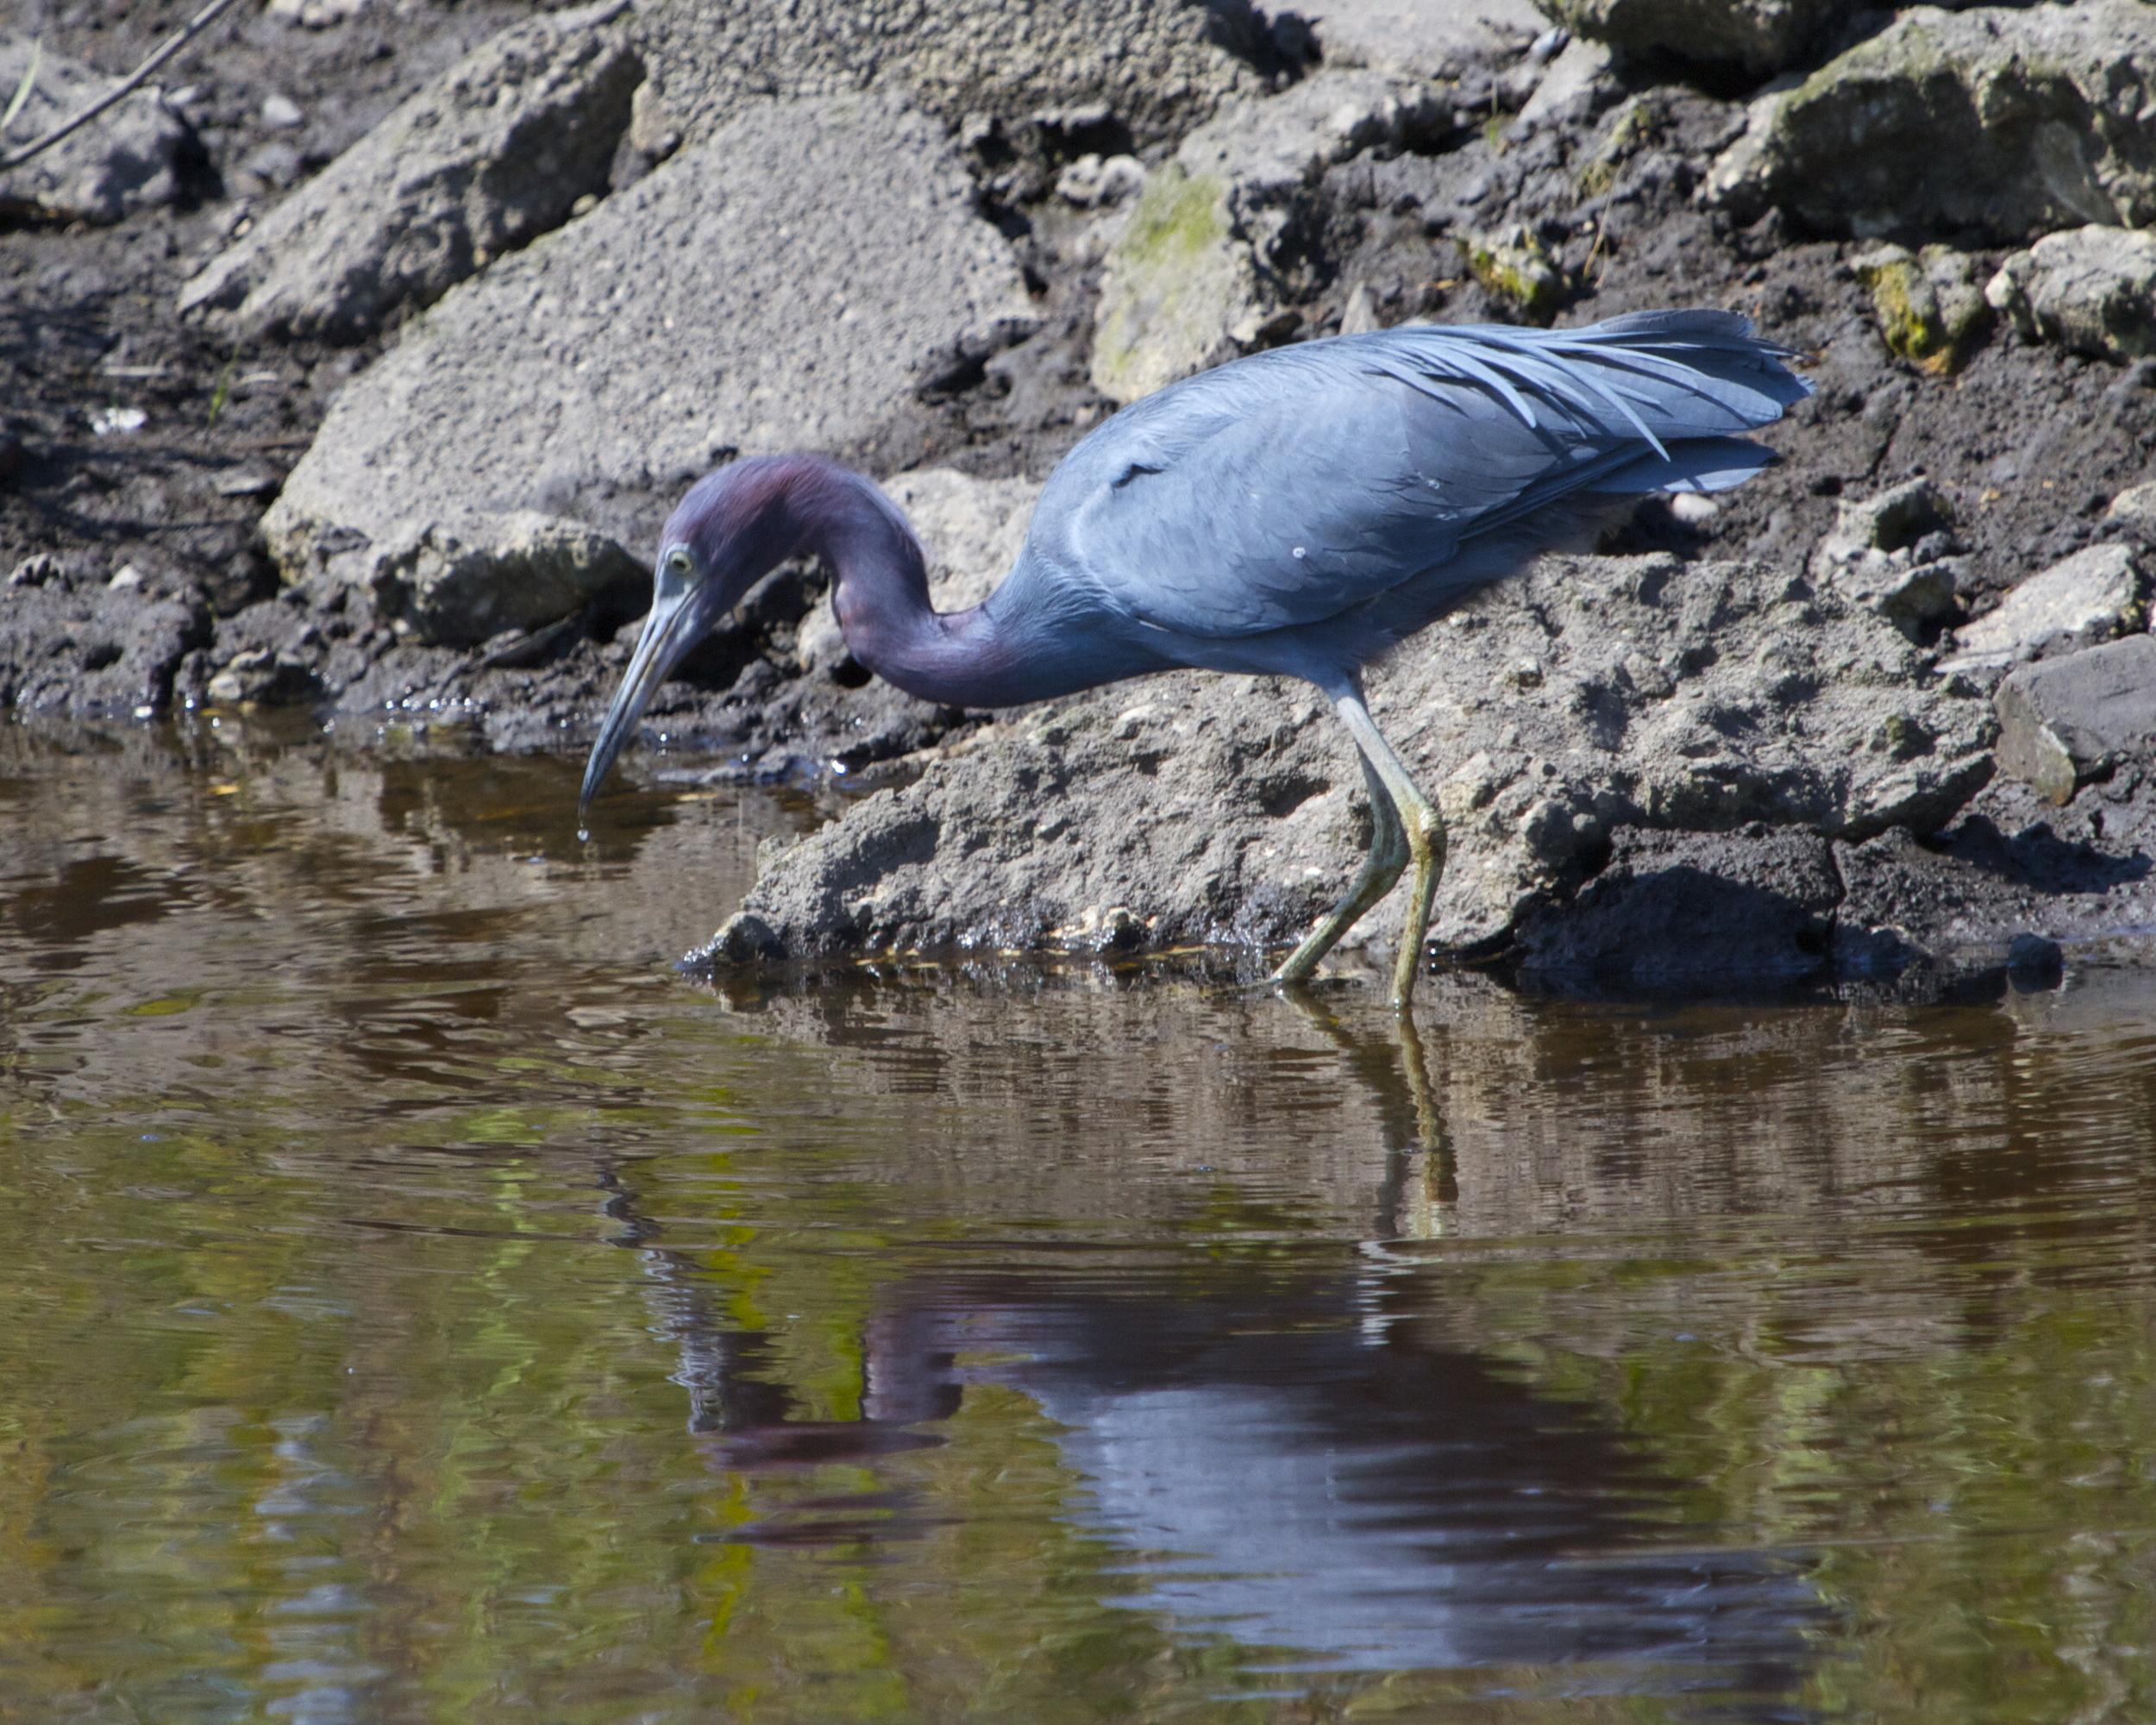 The Little Blue Heron's beak is also turning breeding blue.